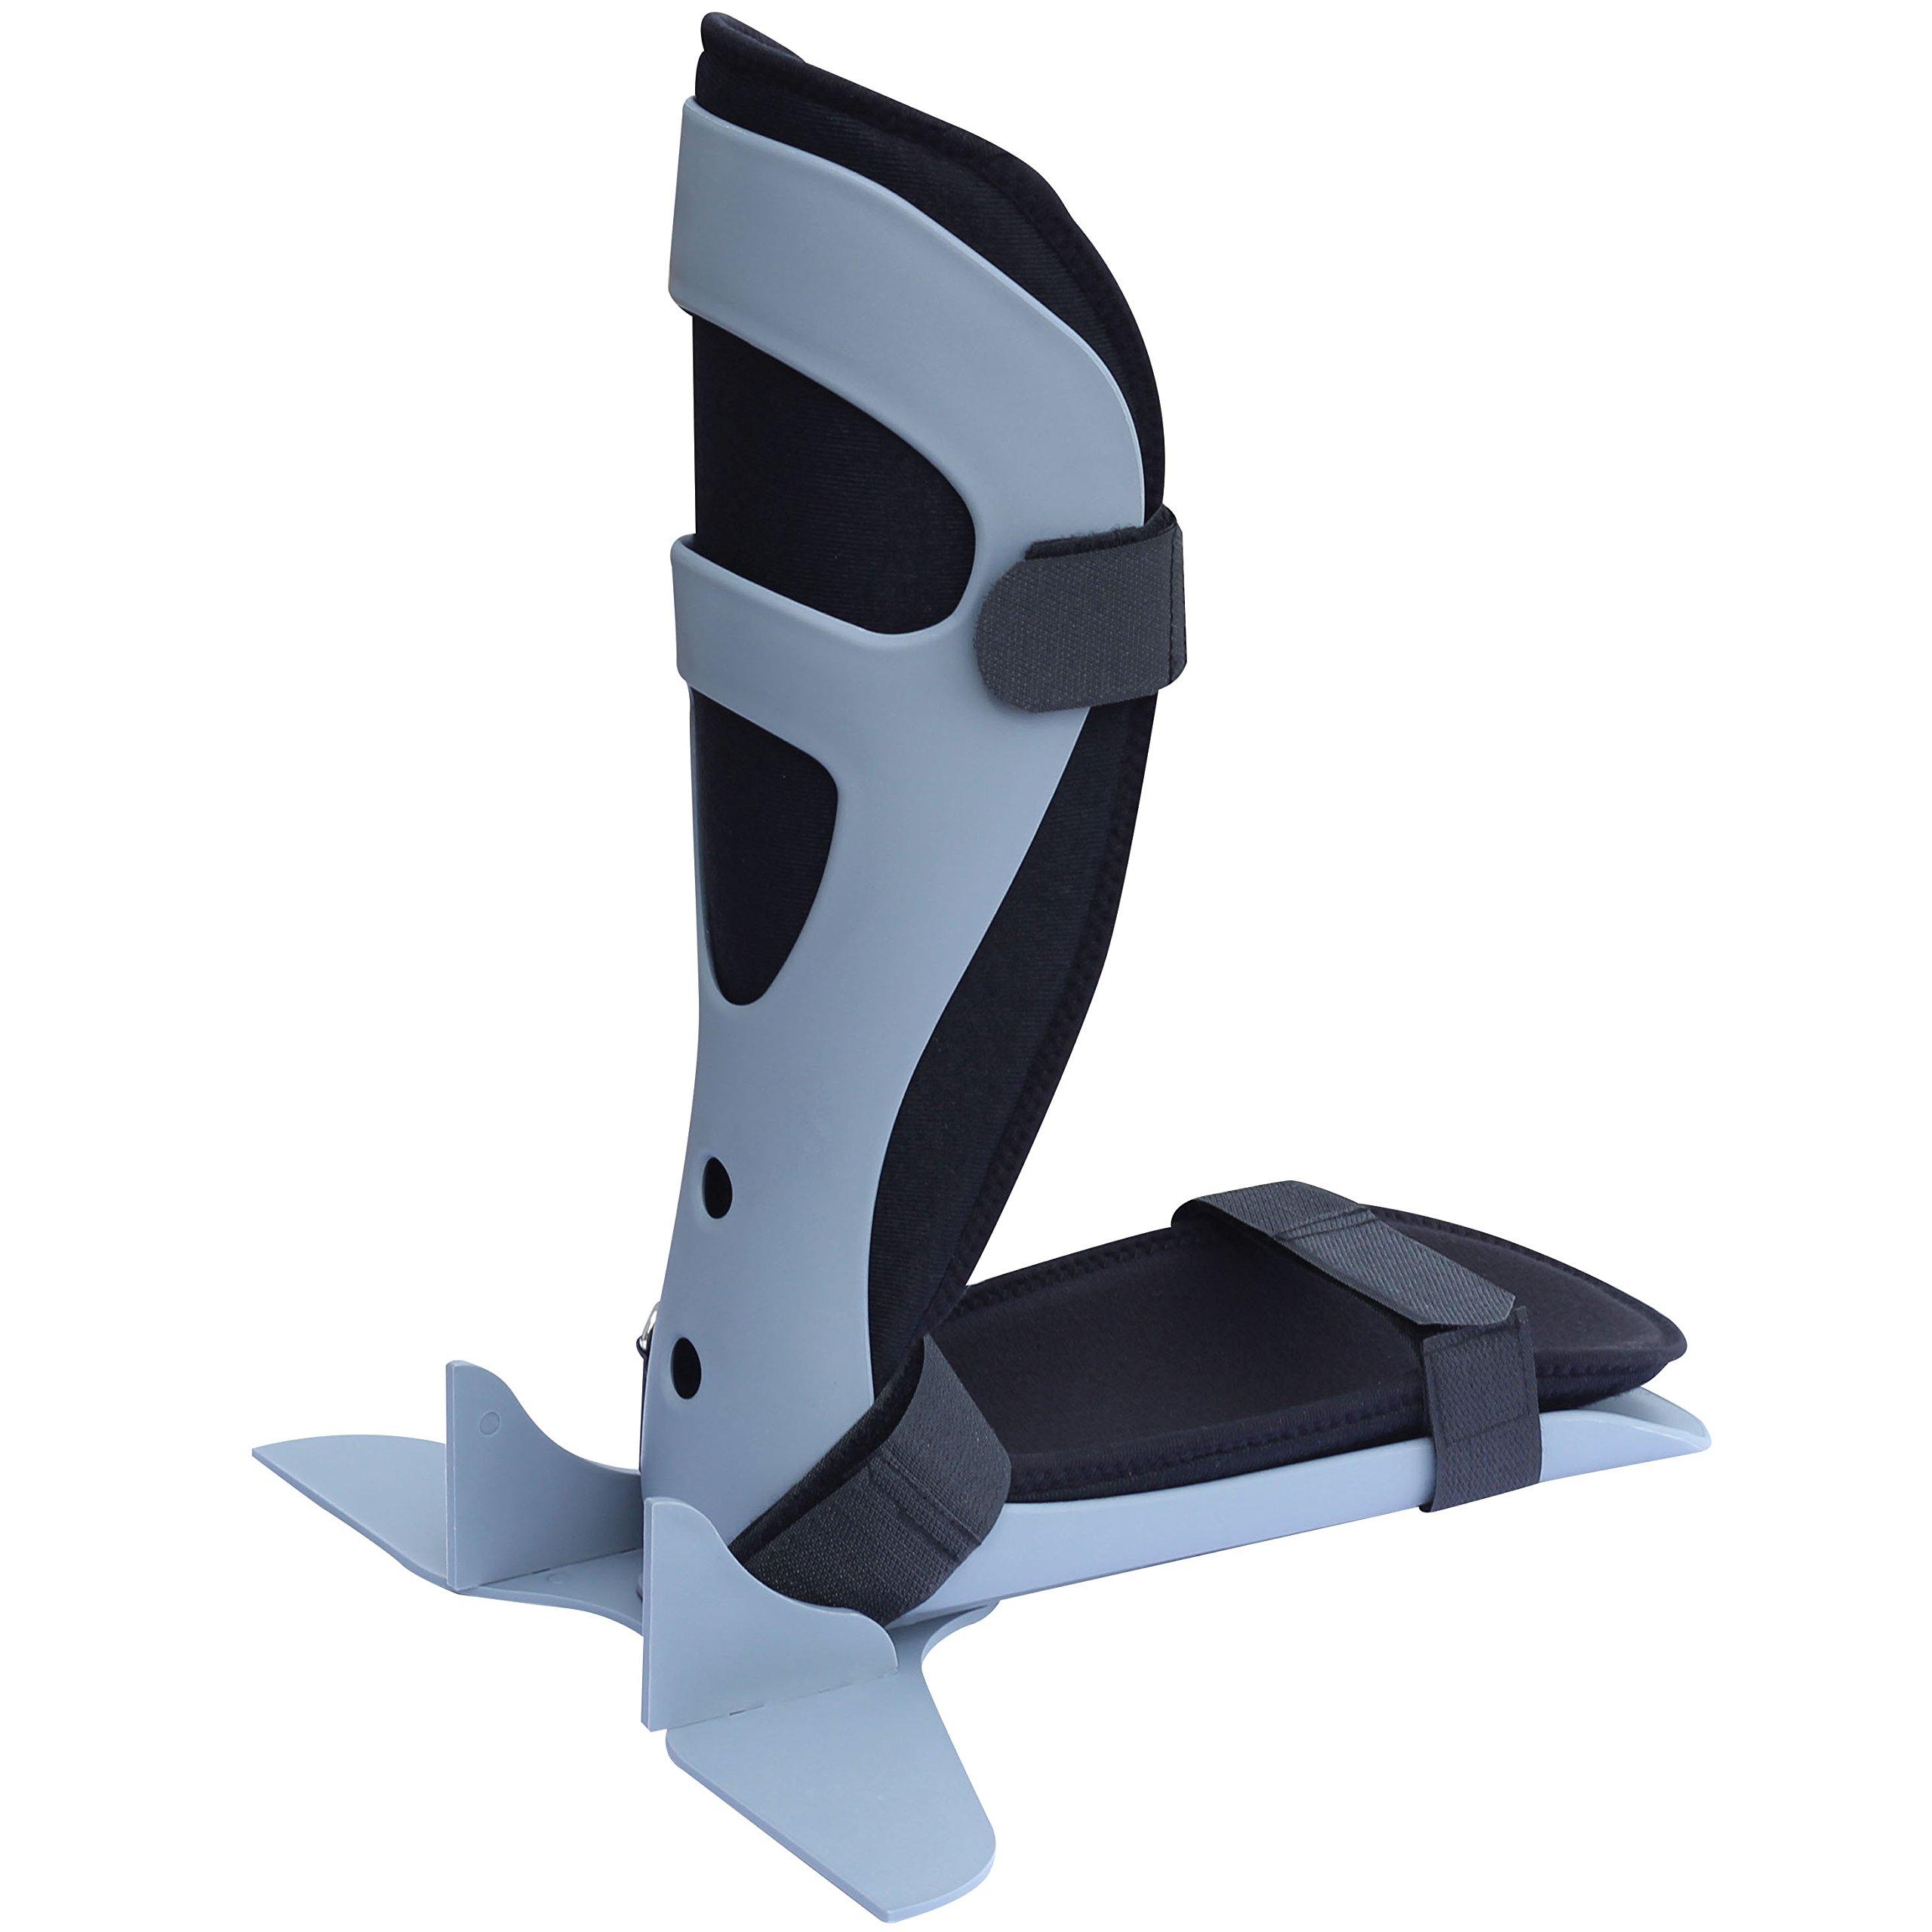 ORTONYX Ankle Anti Rotation AFO Footguard Support Brace - L Black/Gray